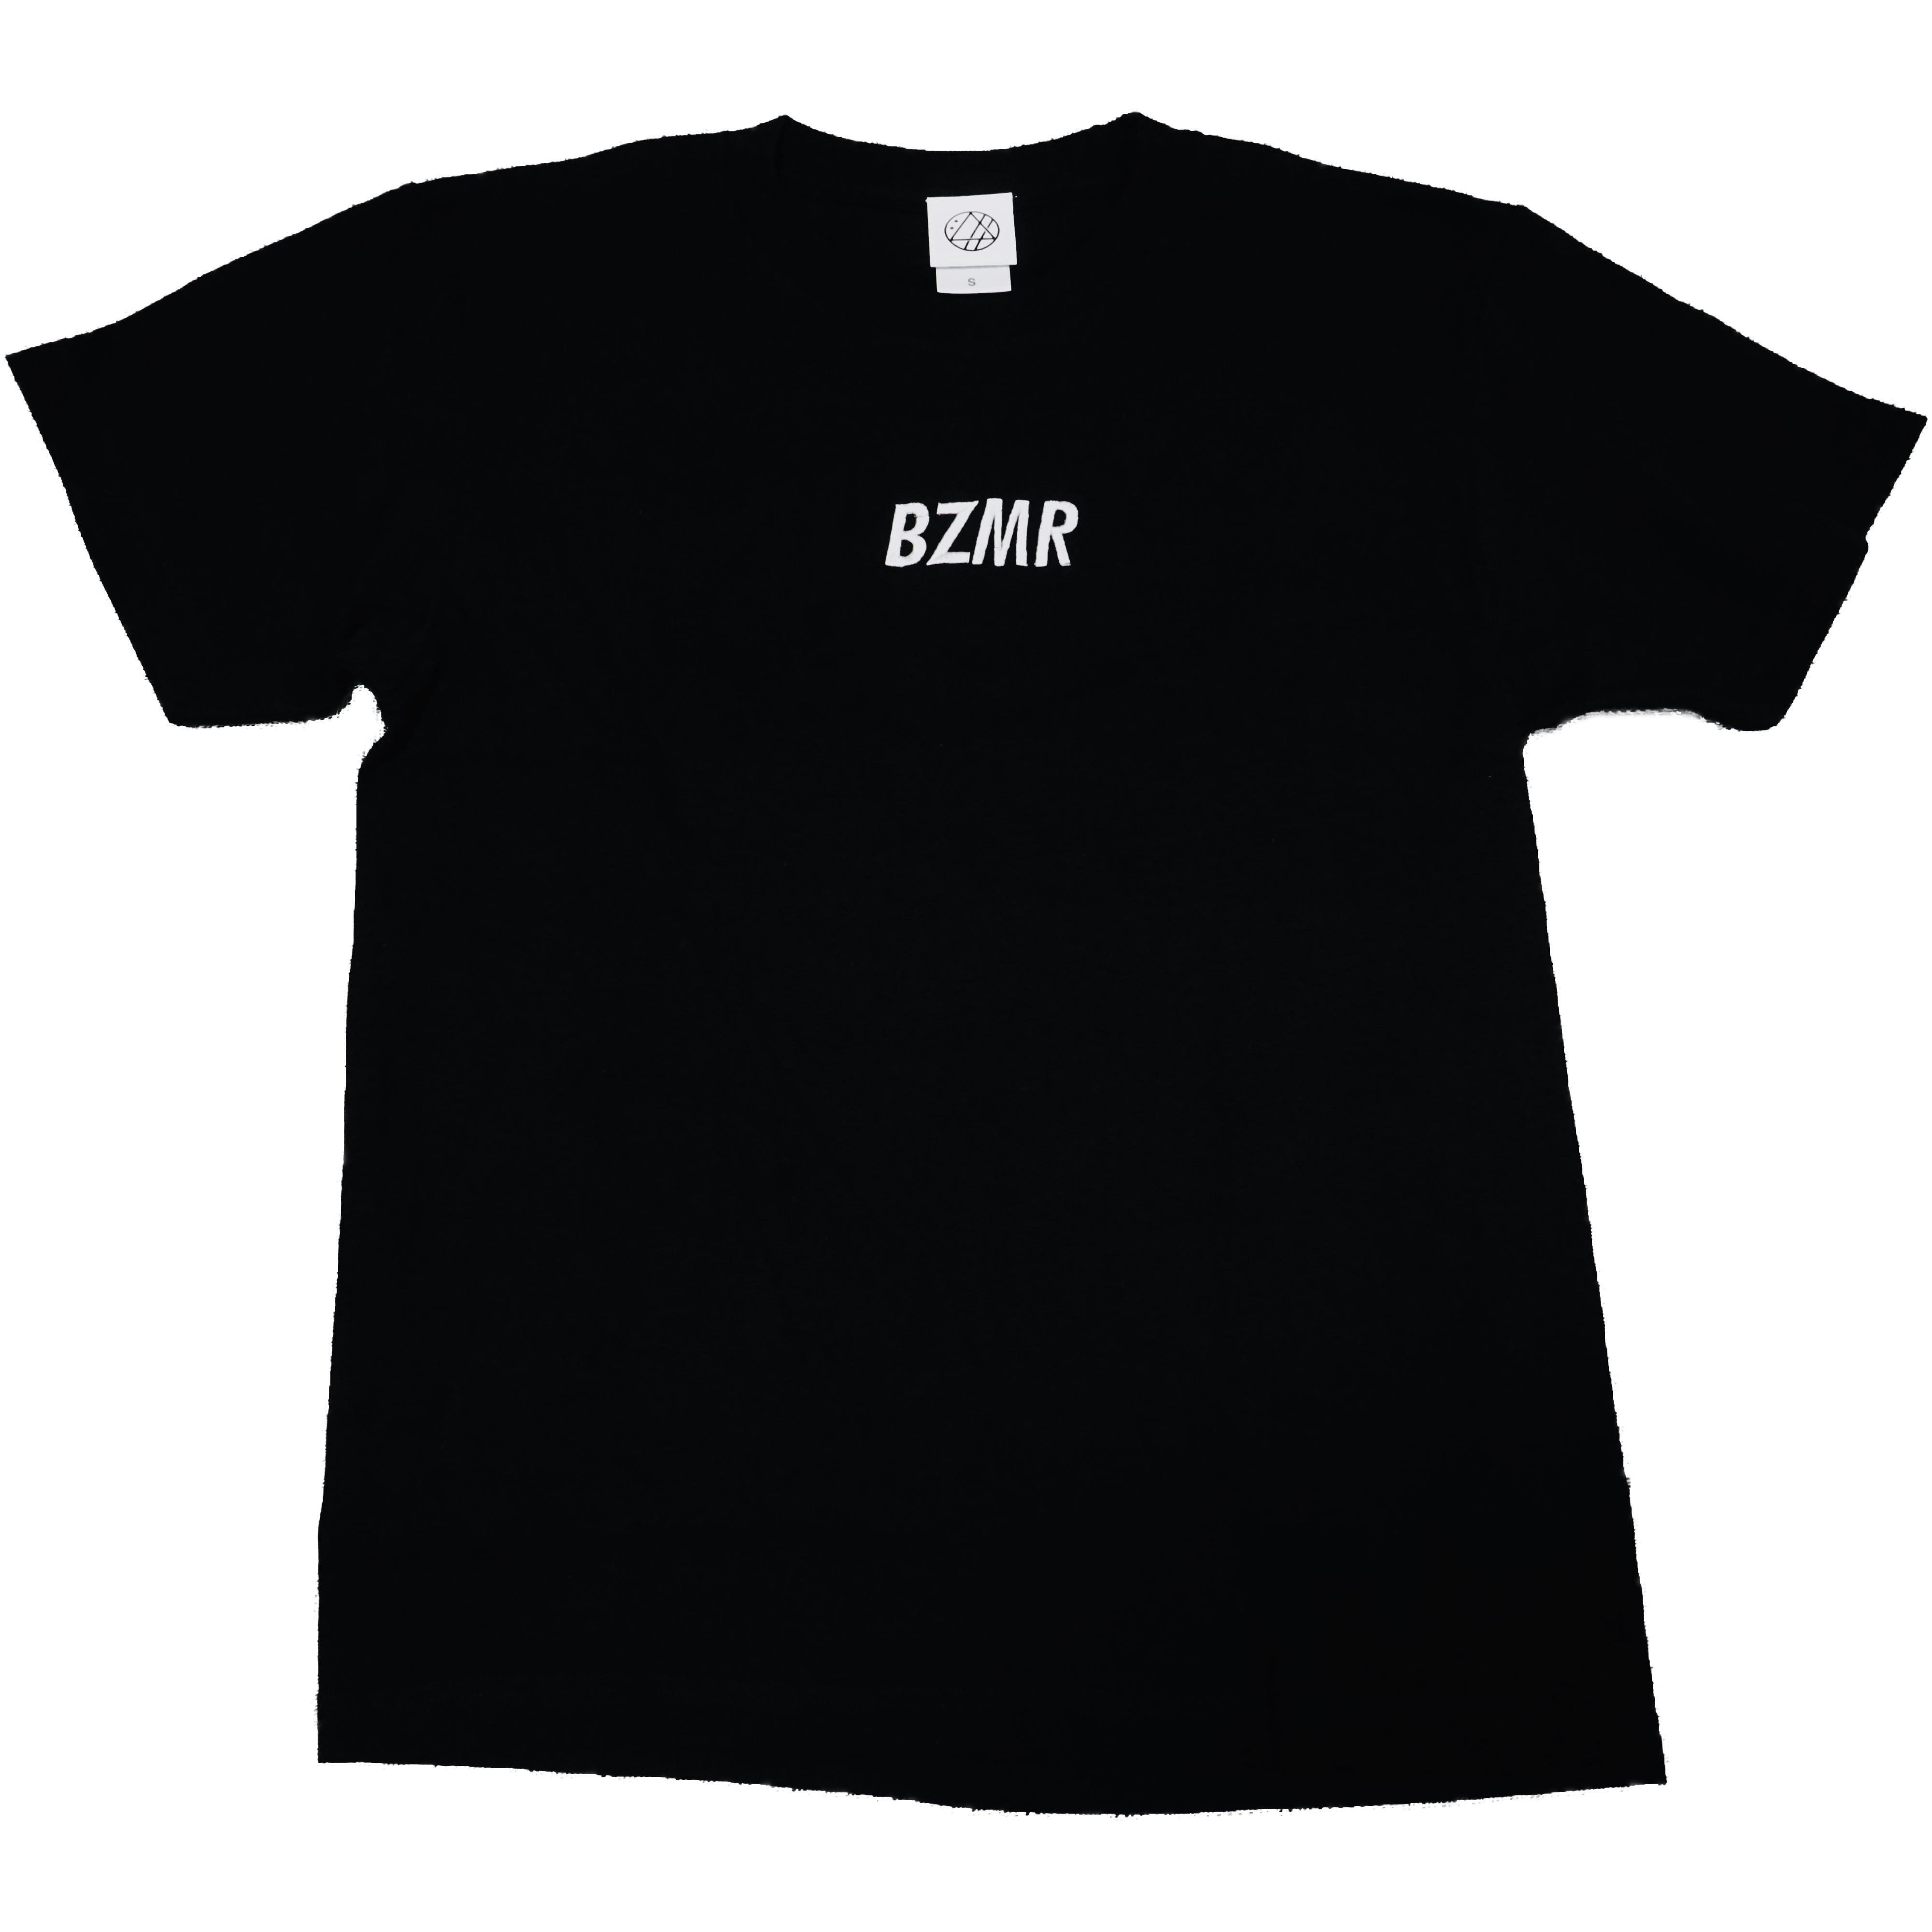 BZMRシンプル刺繍Tee (ブラック) - 画像1